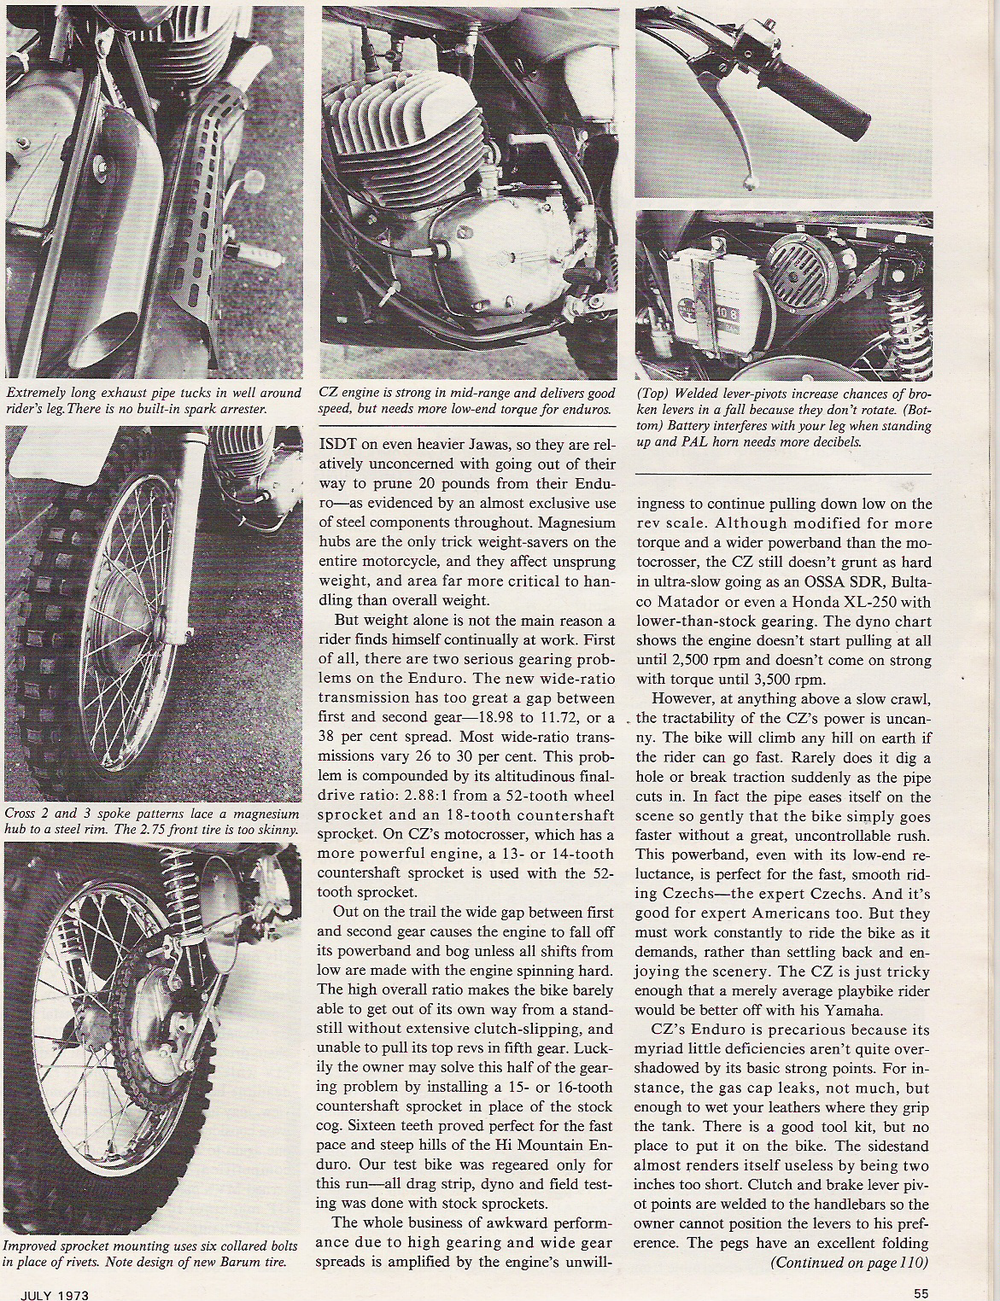 1973_CZ-250enduro_roadtest_p6.png